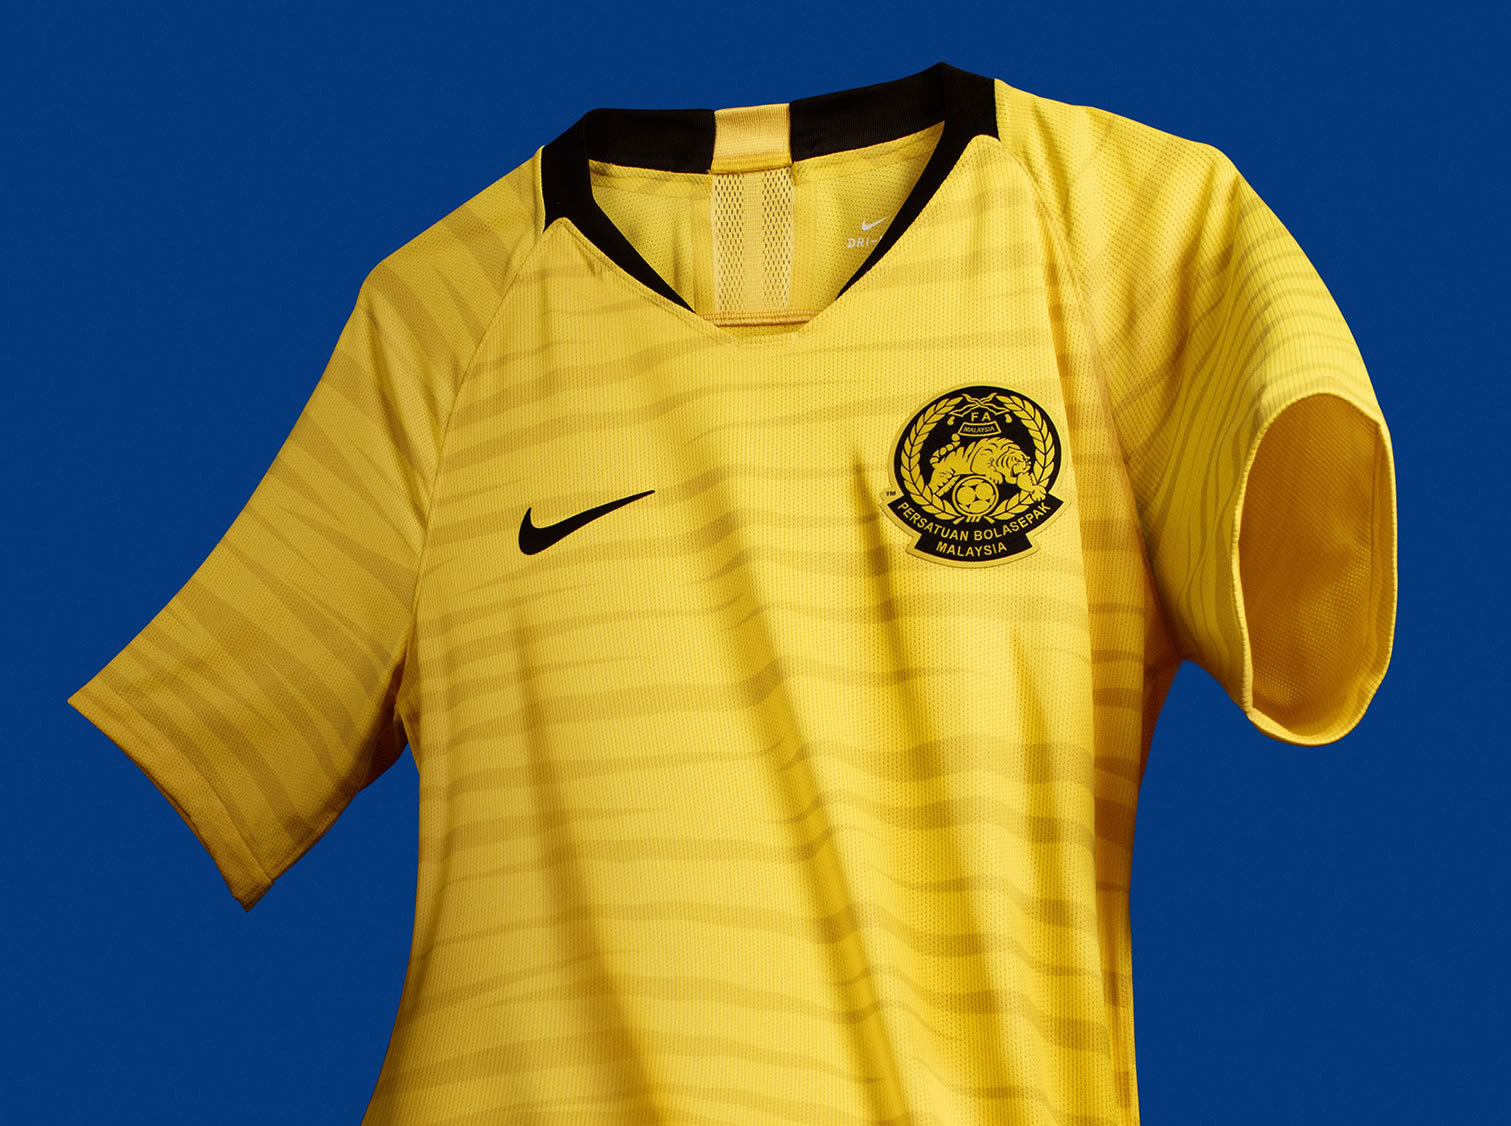 Camiseta titular de Malasia 2018/19 | Imagen Nike